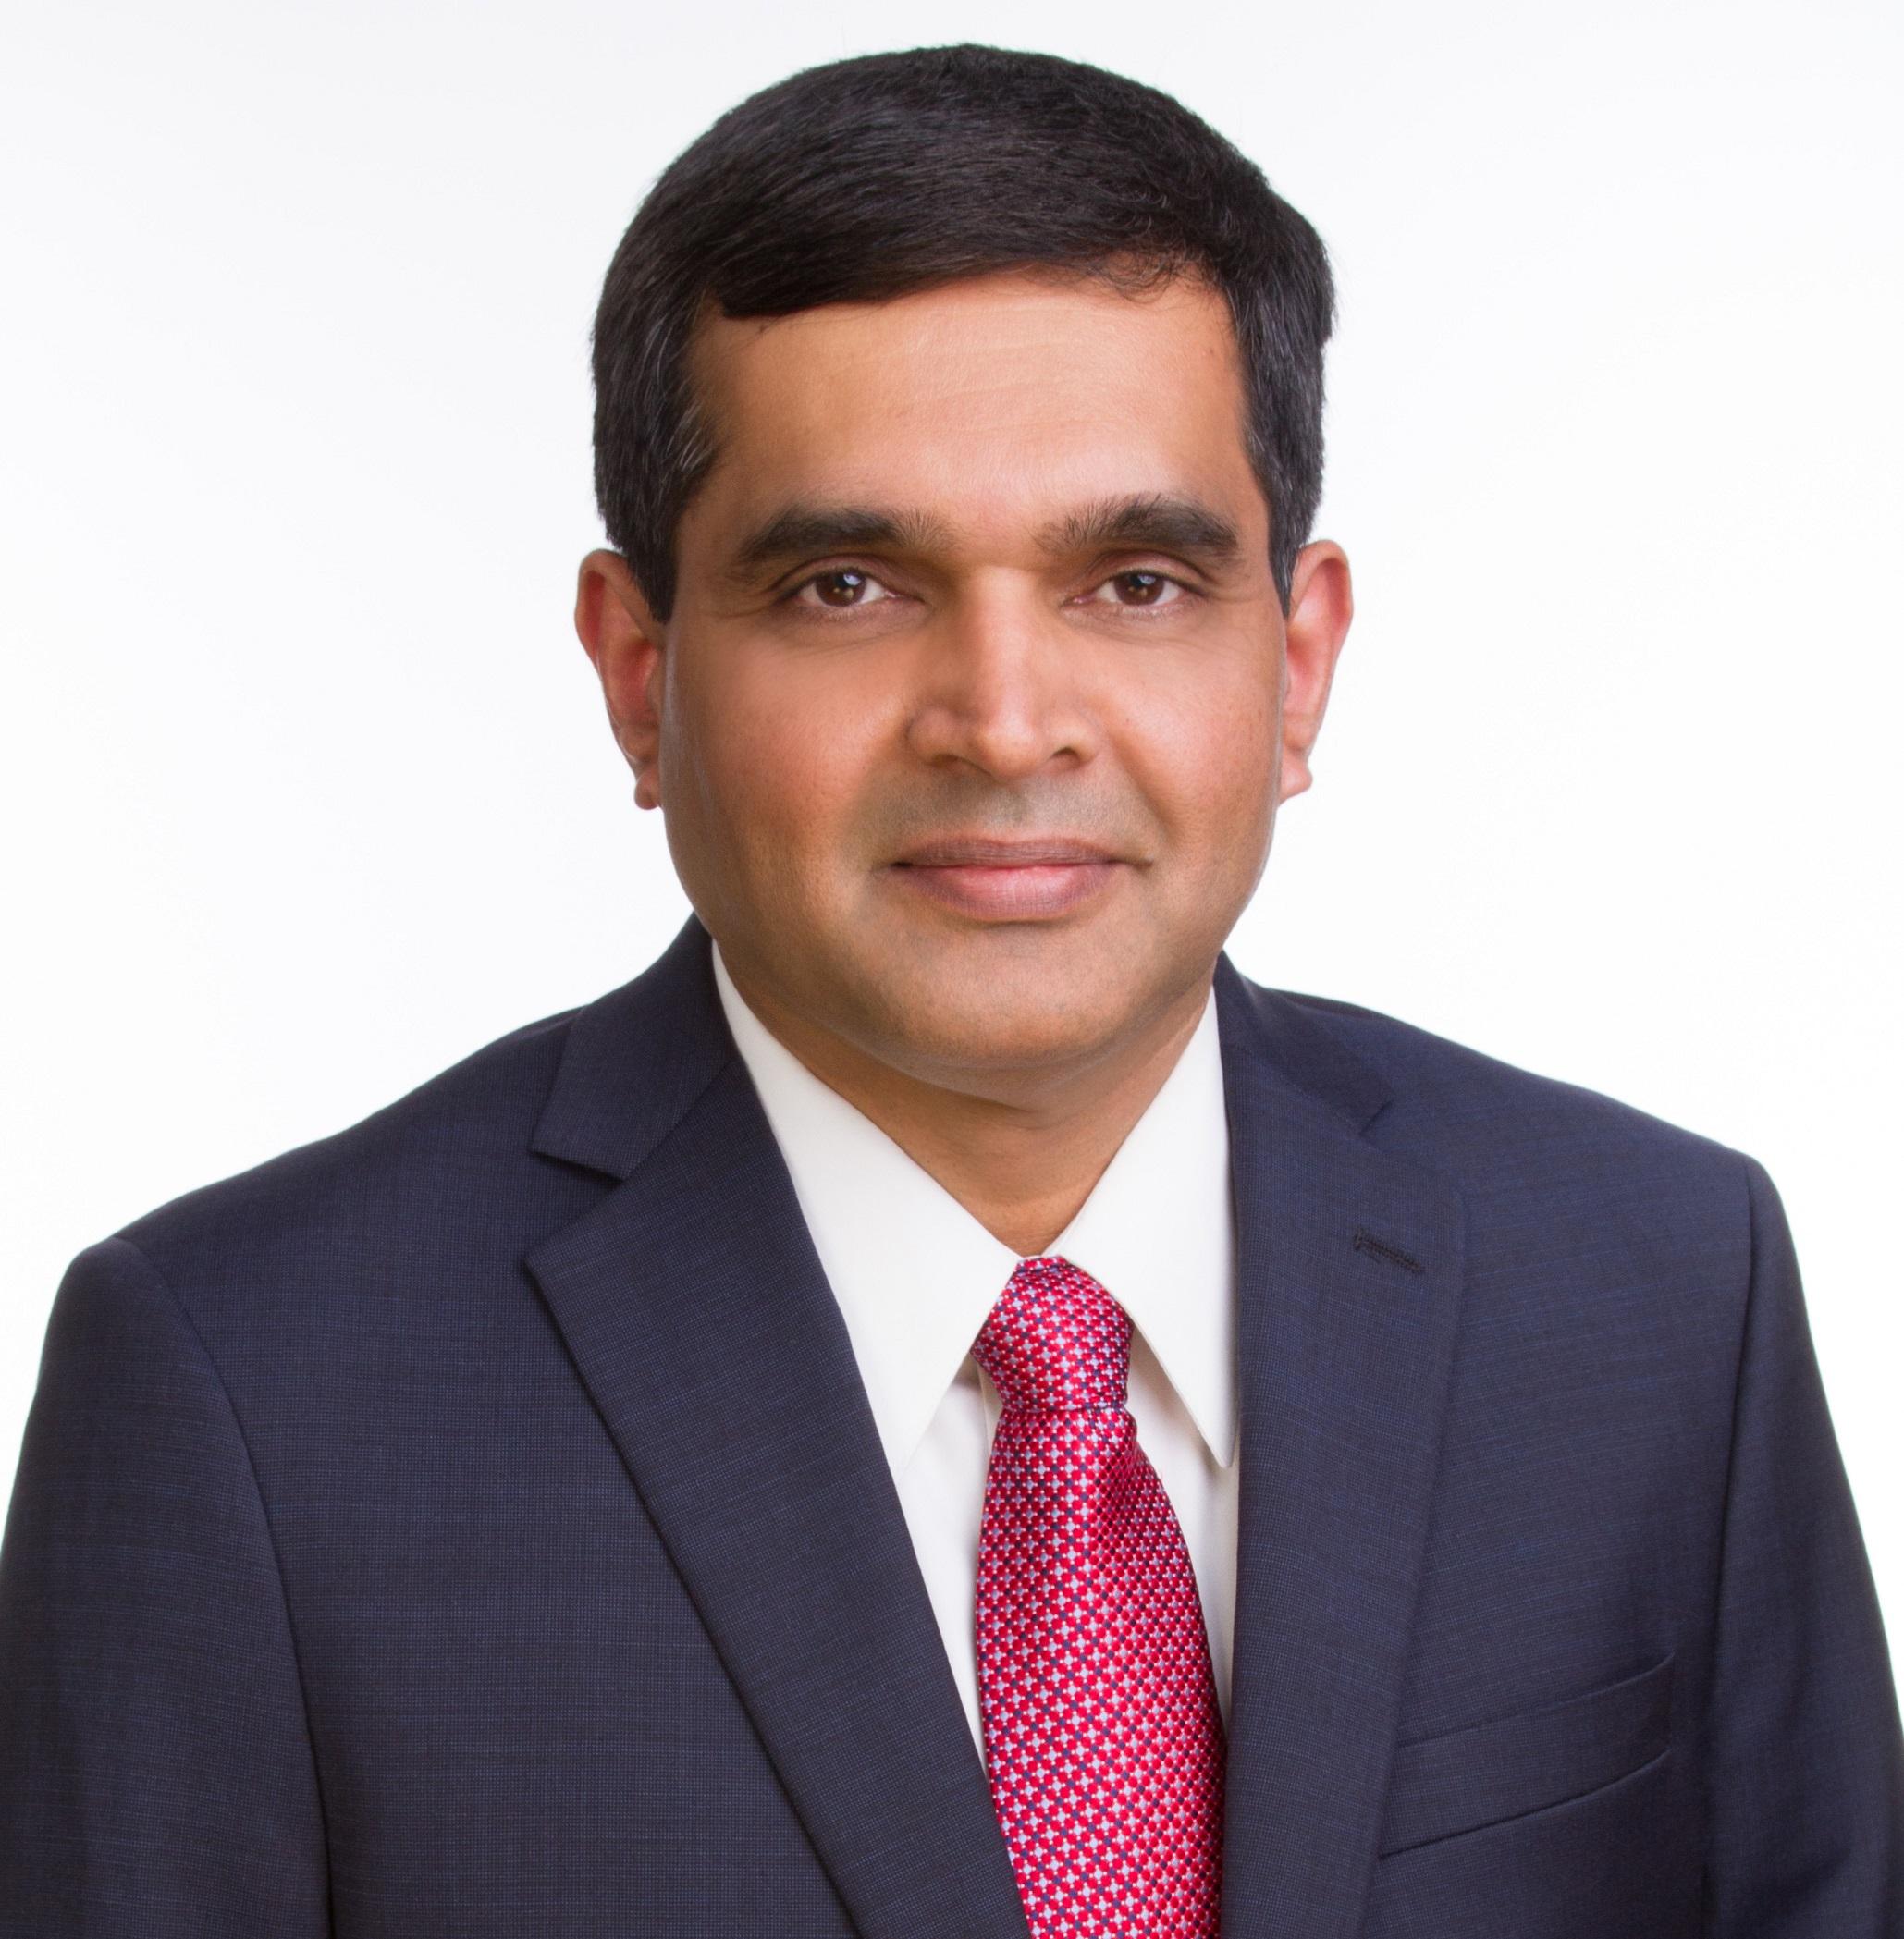 Laxmi Narayan Bhat